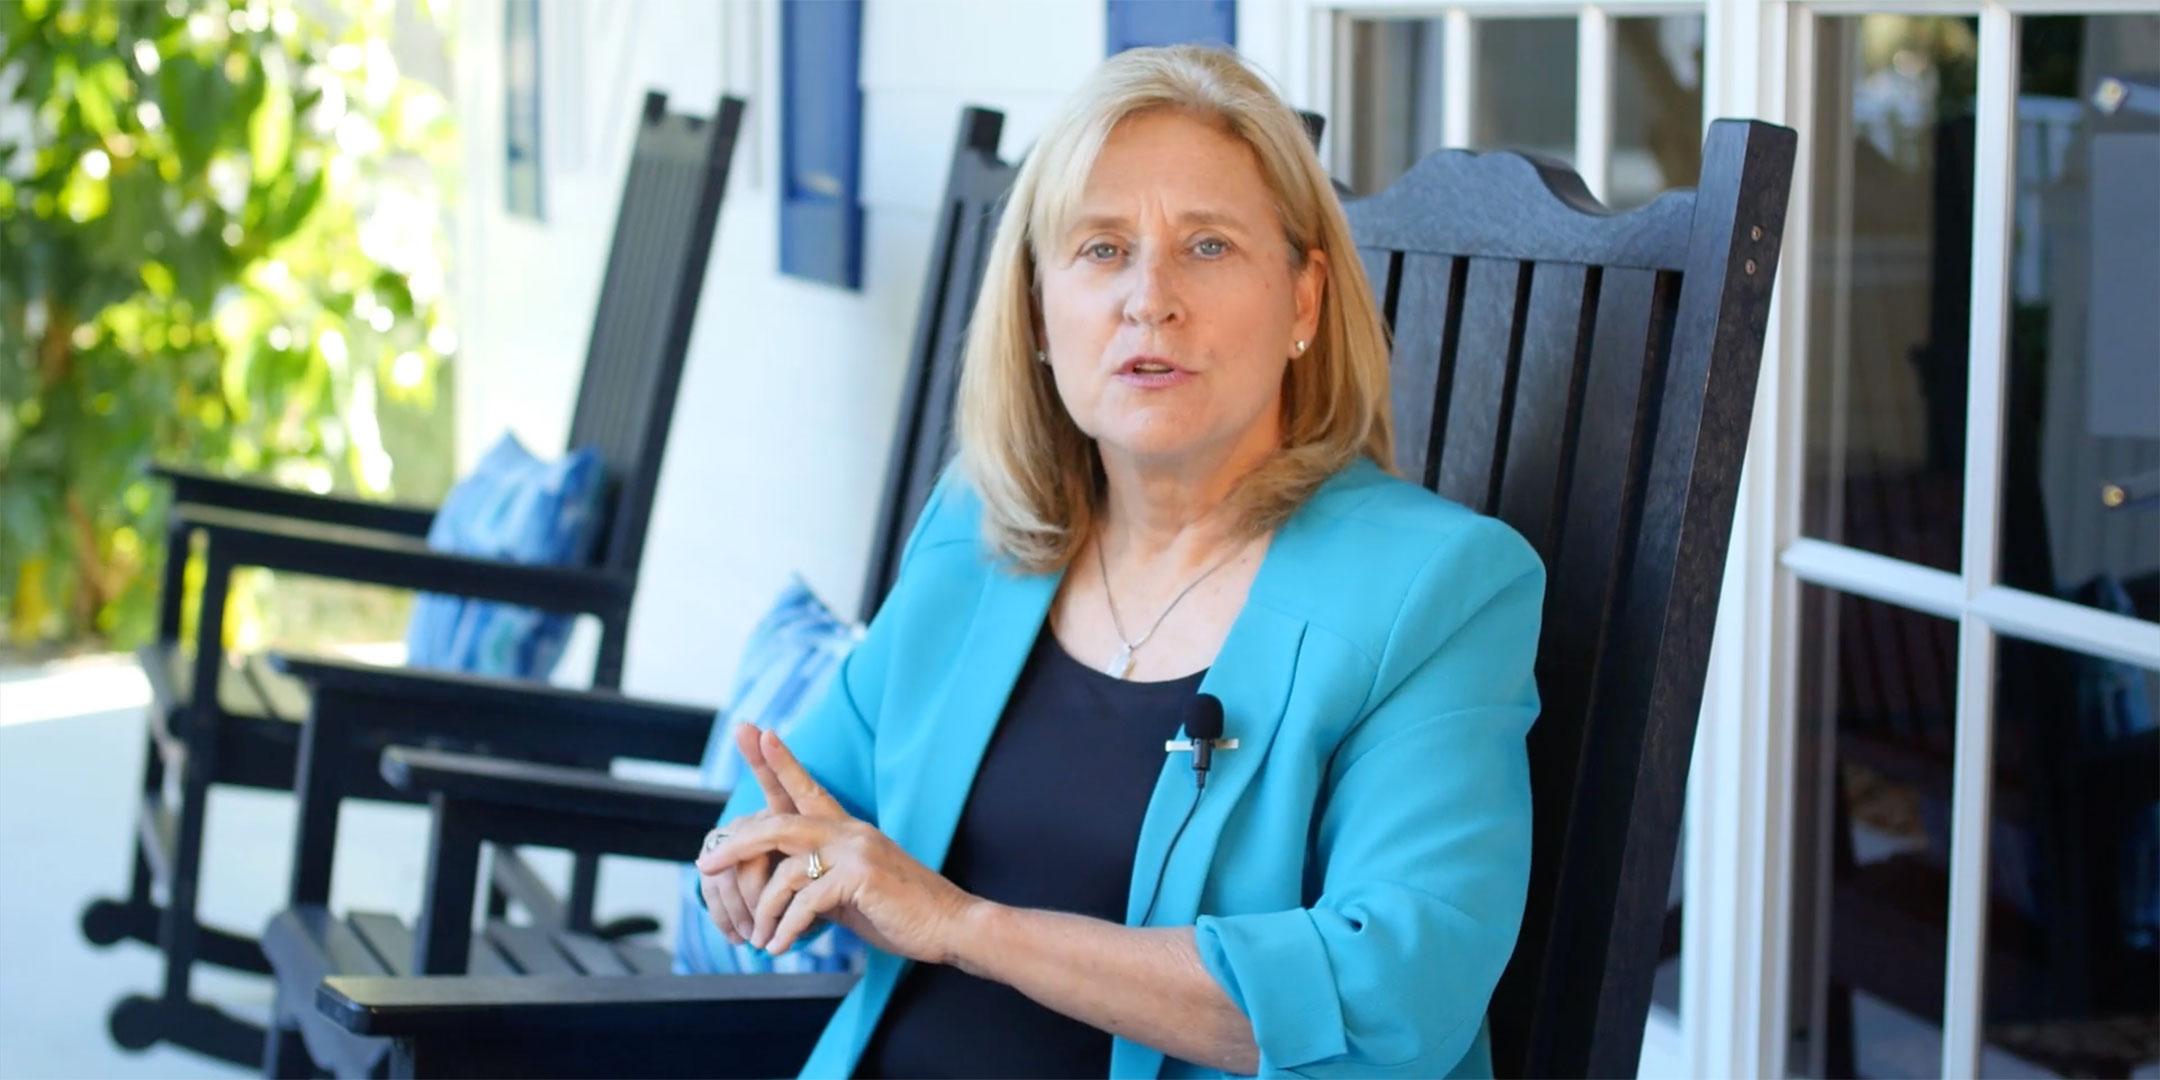 Dr. Becky Bailey